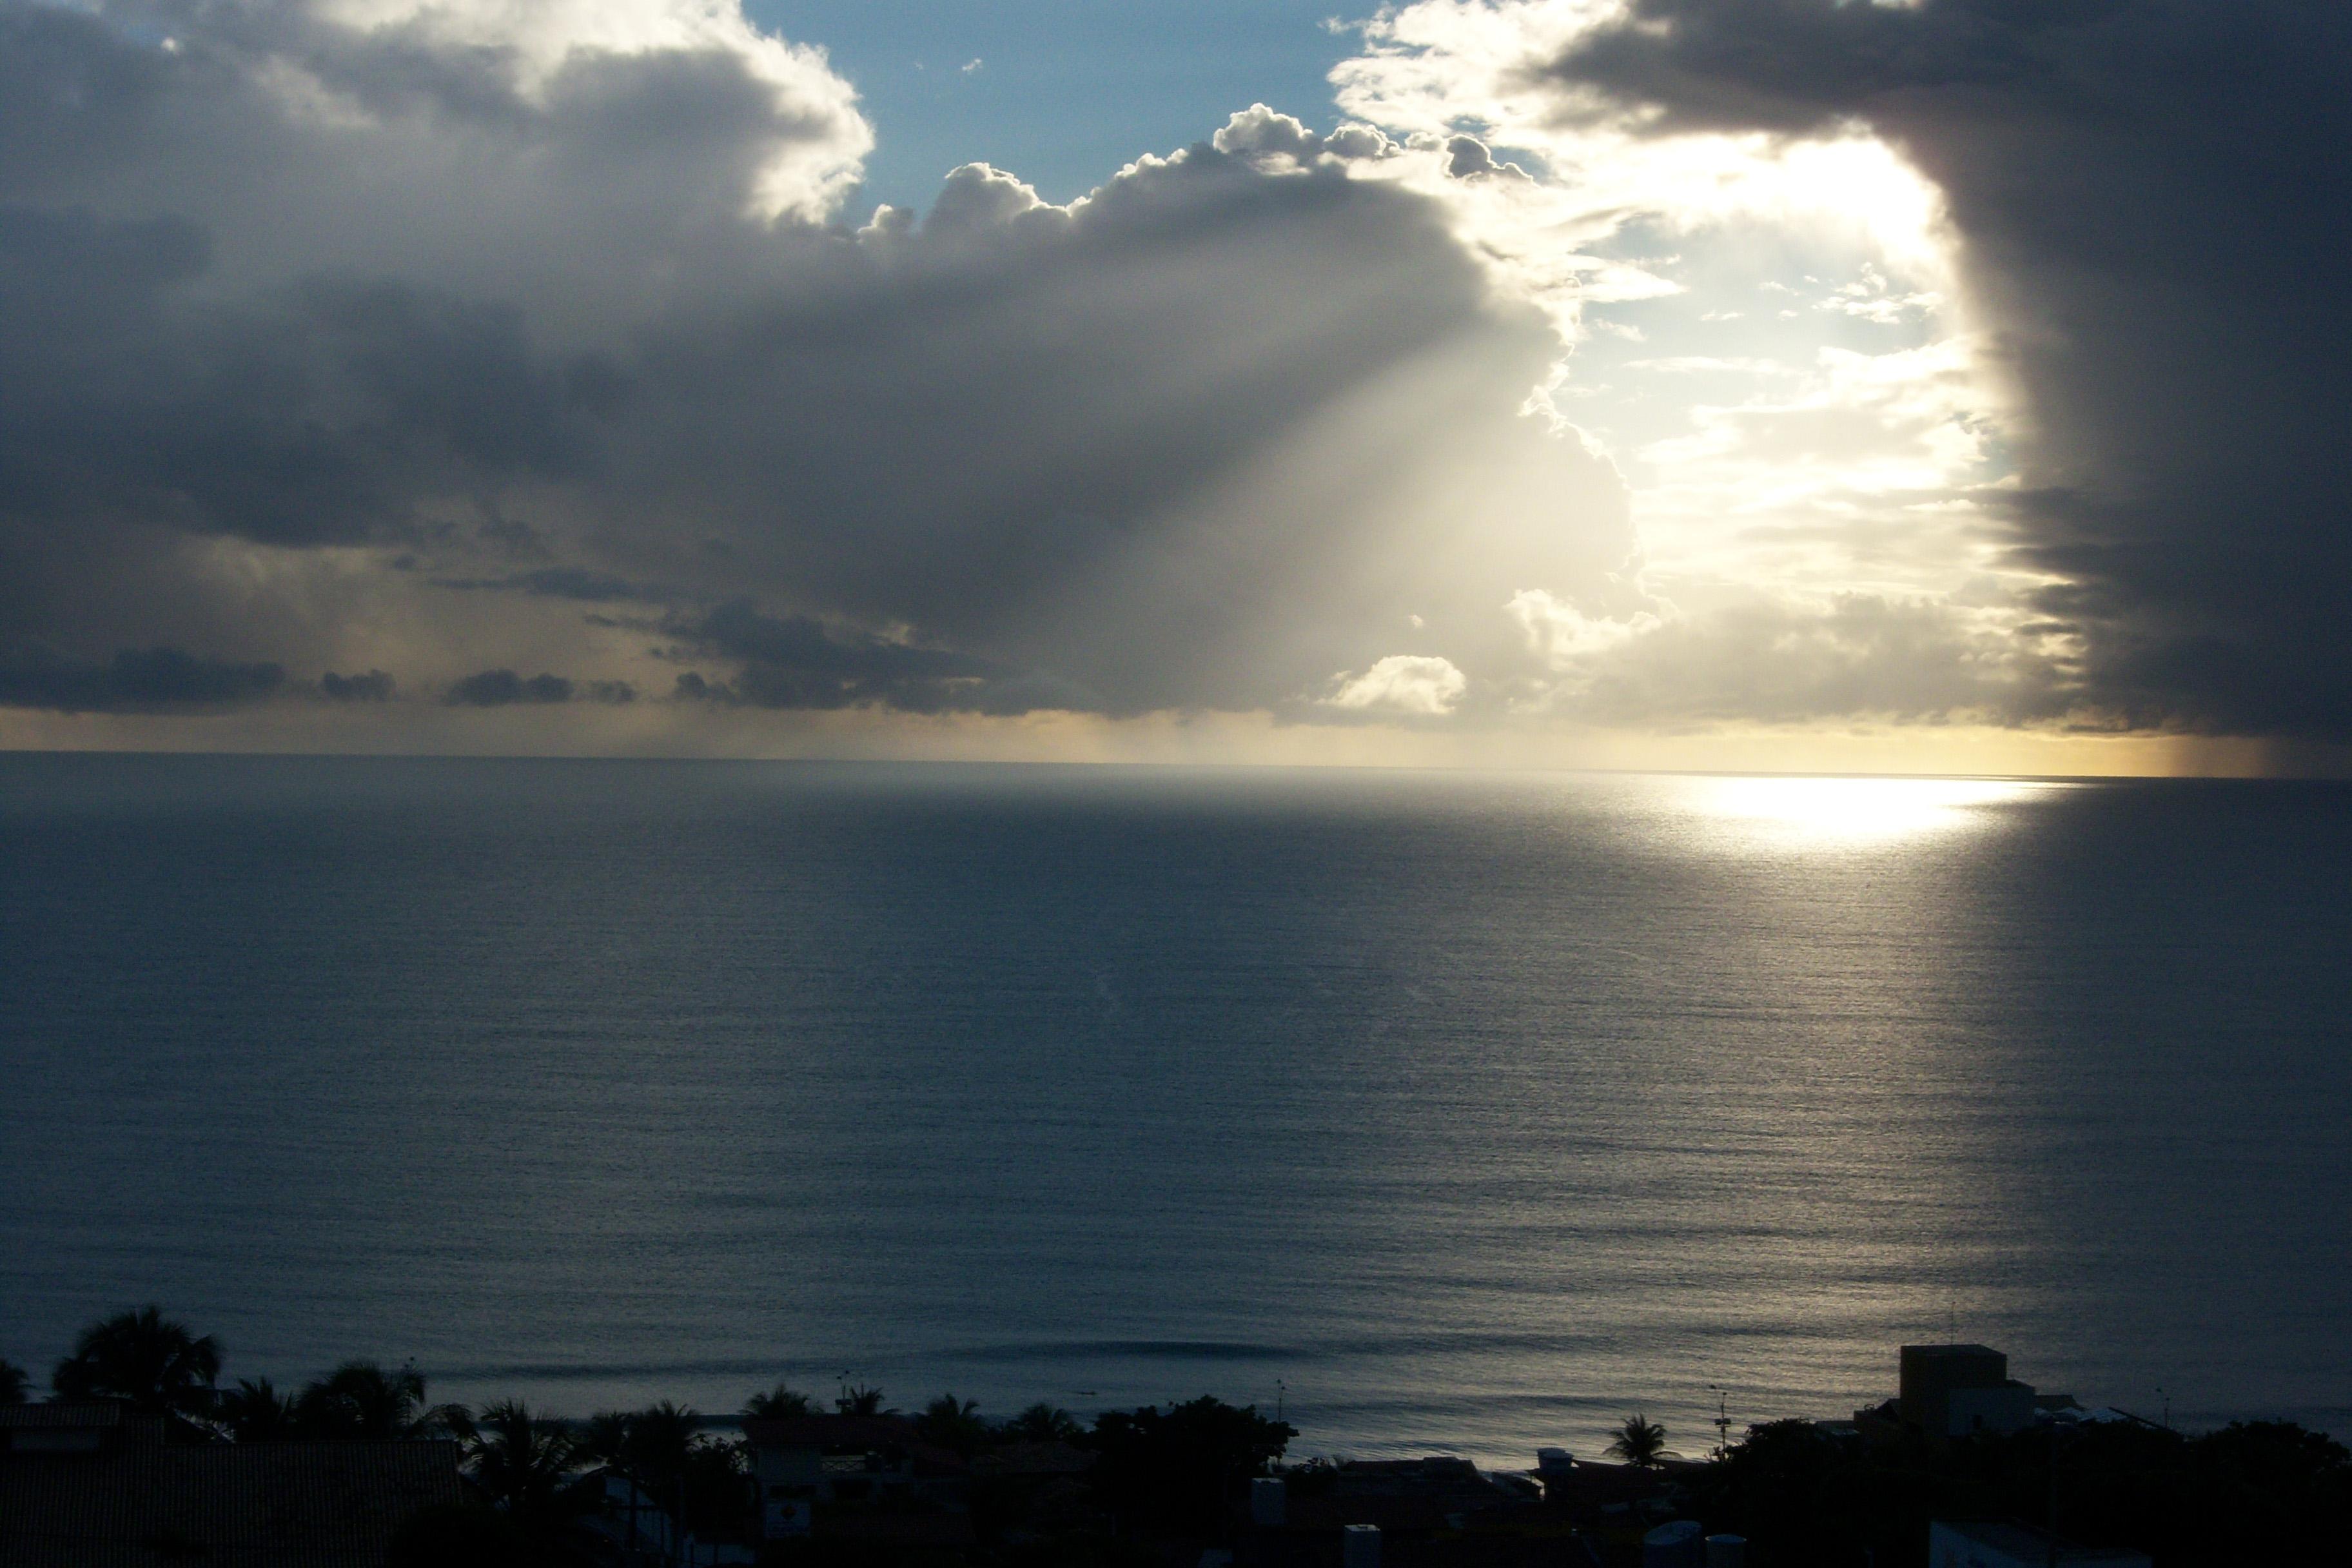 File:Nascer do sol Natal RN Brasil 02.JPG - Wikimedia Commons